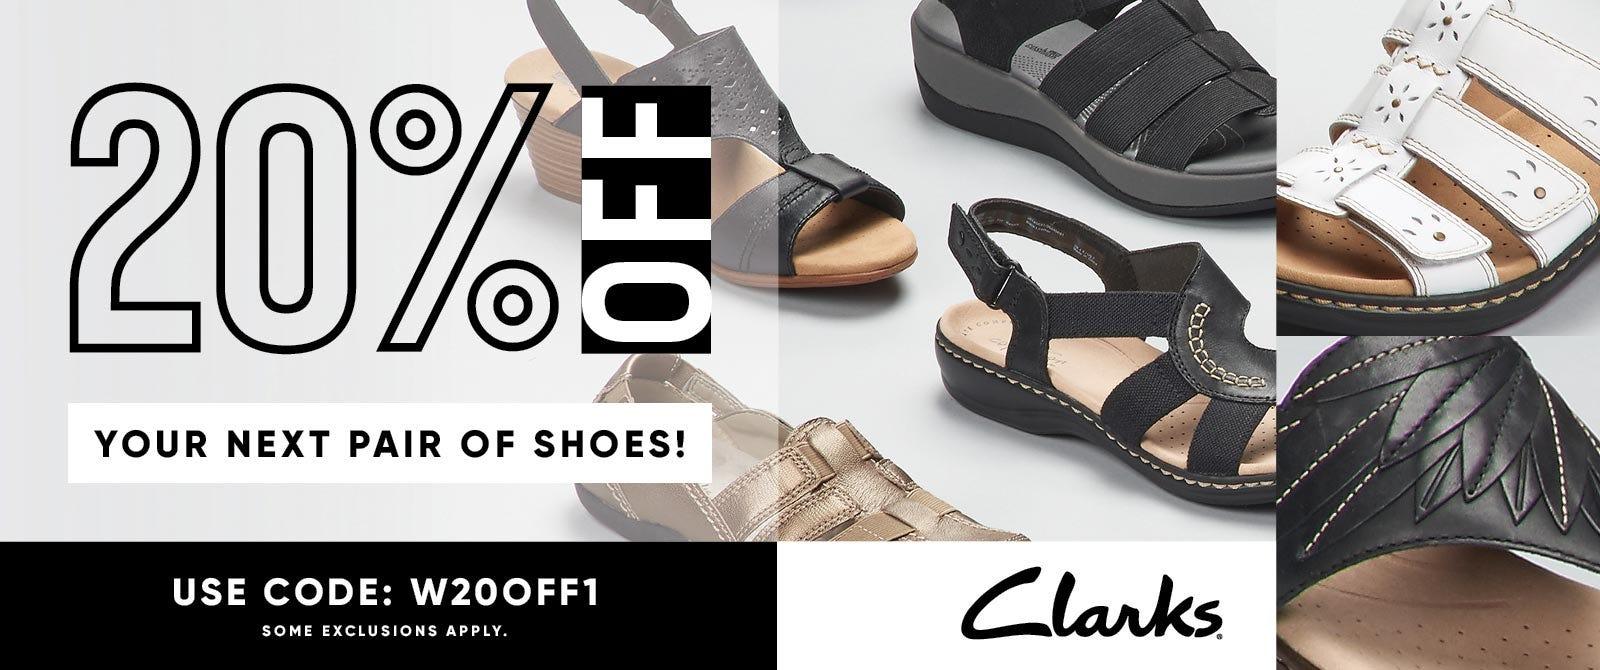 Best Deals on Brand Name Shoes   Footwear  9f7ea1c59